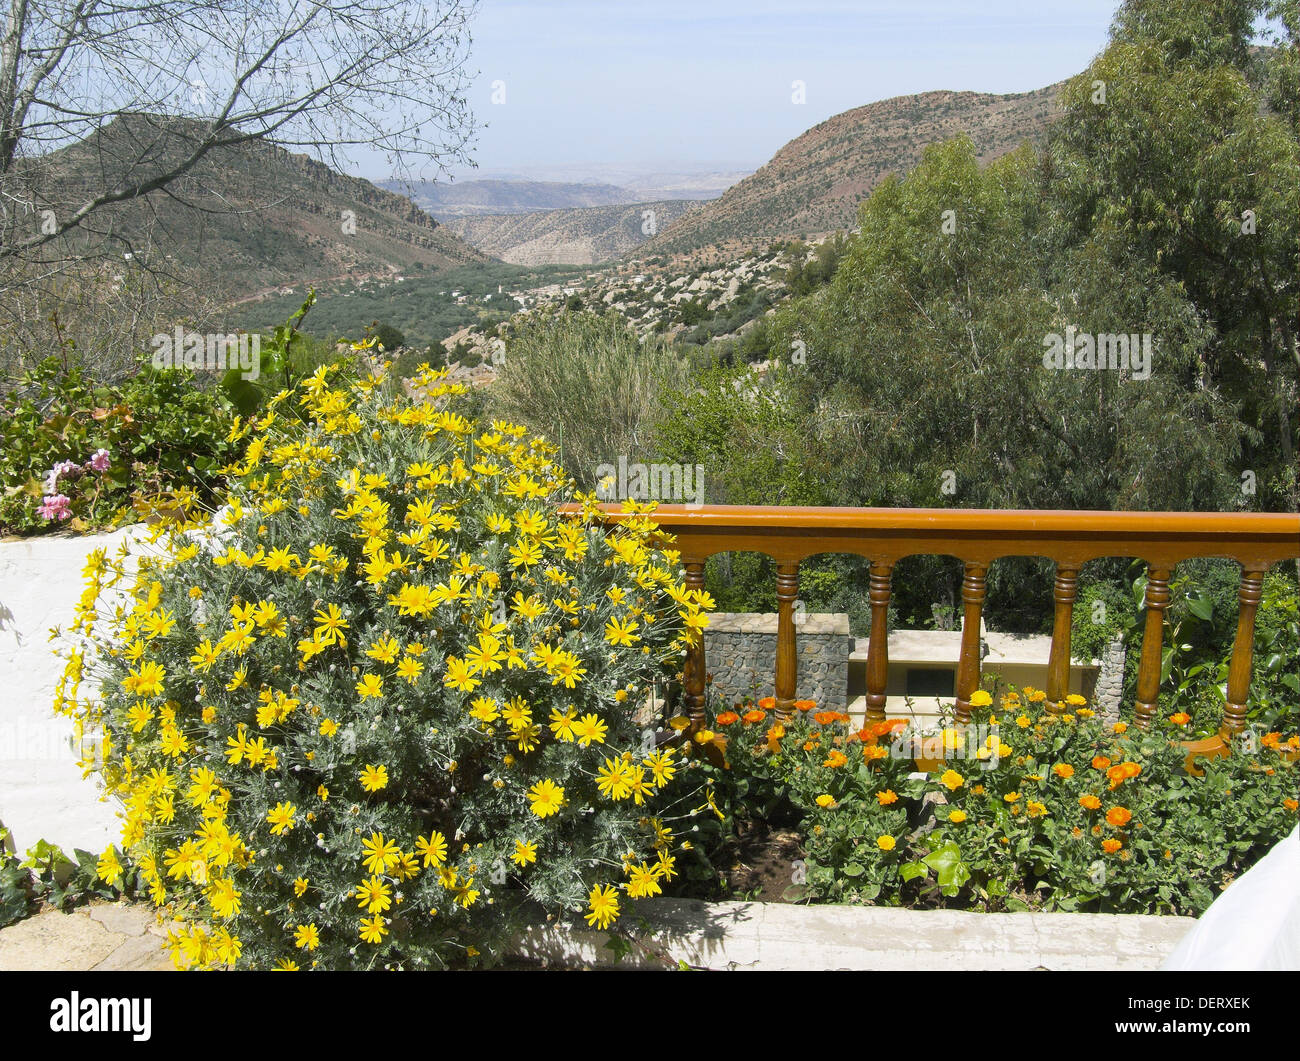 Garden Of Hotel Des Cascades Immouzer Agadir Region Morocco Stock Photo Alamy